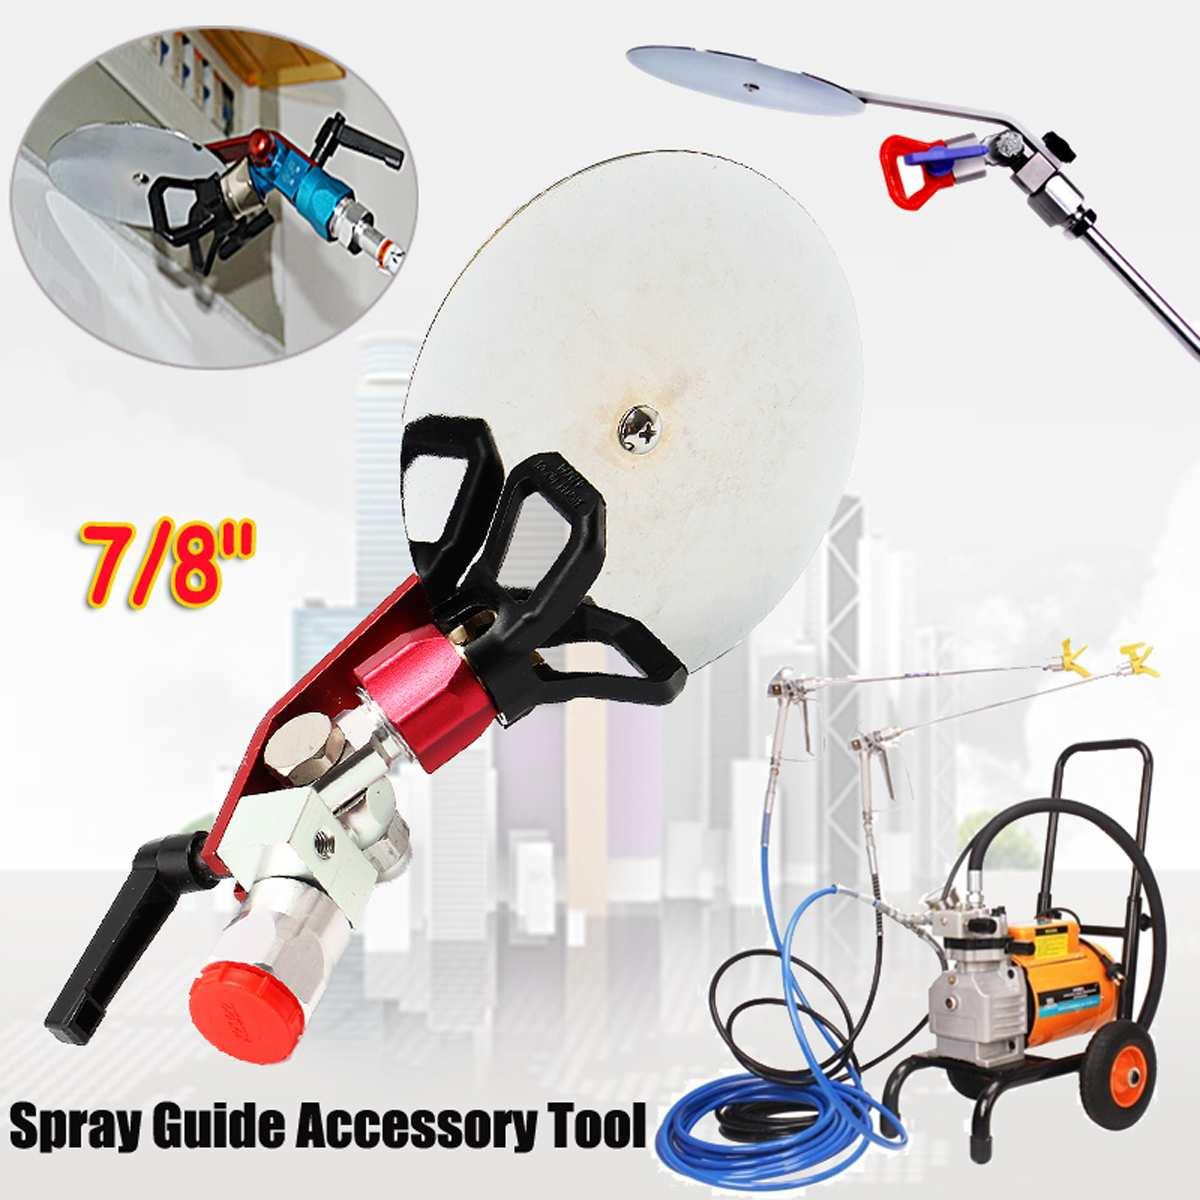 7/8'' Spray Guide Accessory Tool For Paint Sprayer 7/8'' Spray G U N Universal Airless Spraying Machine